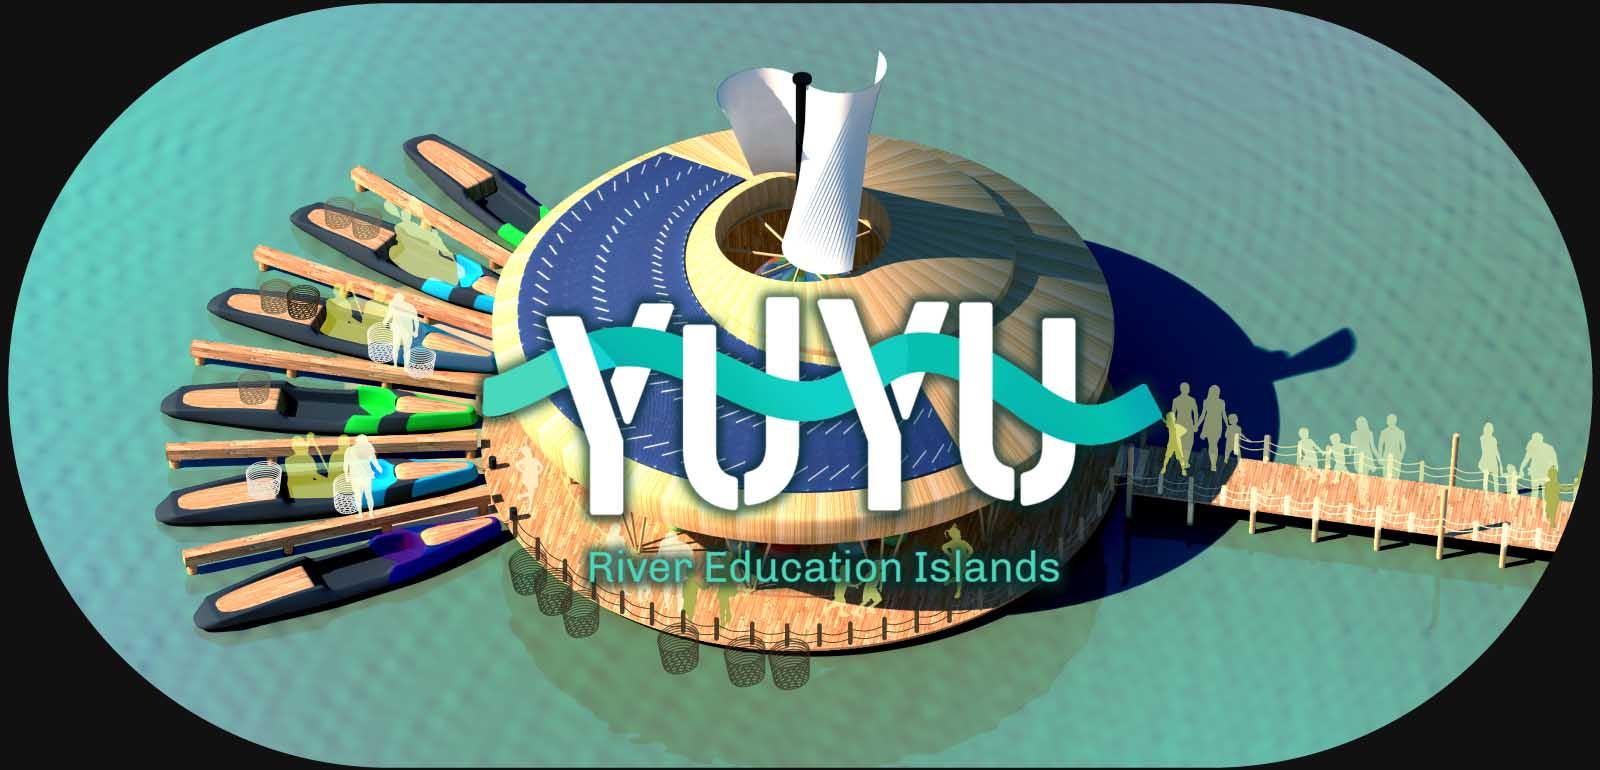 YUYU River Education Islands